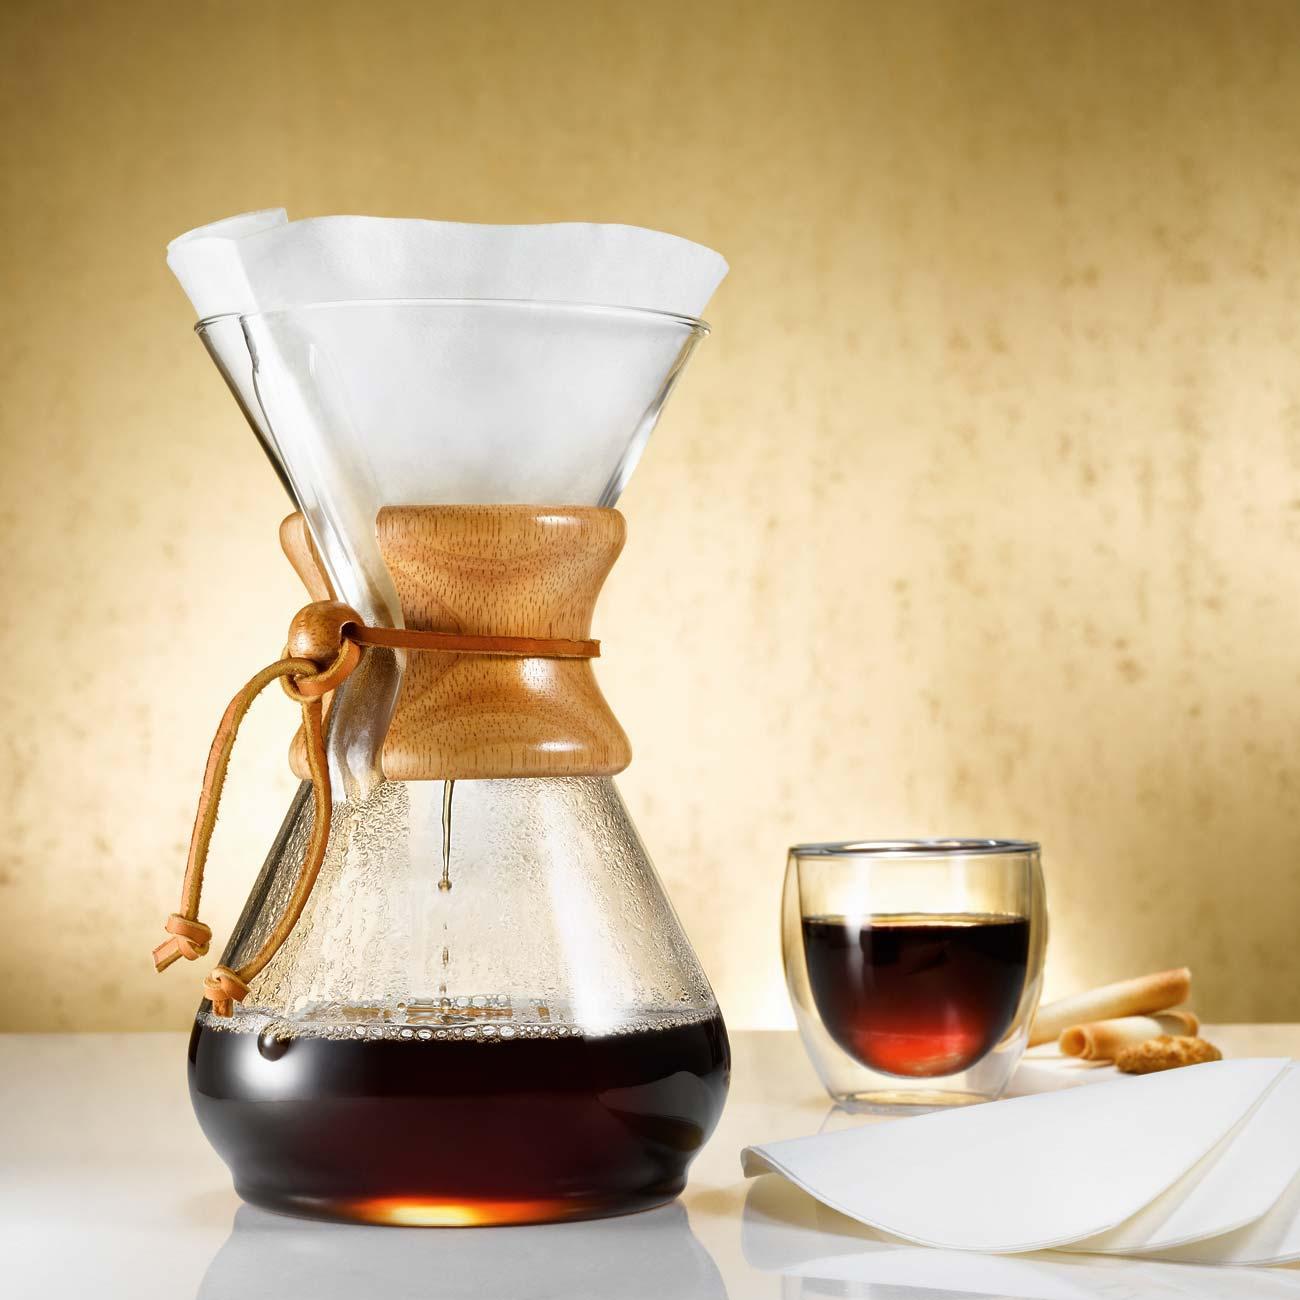 Chemex® Kaffee-Karaffe | 3 Jahre Garantie | Pro-Idee